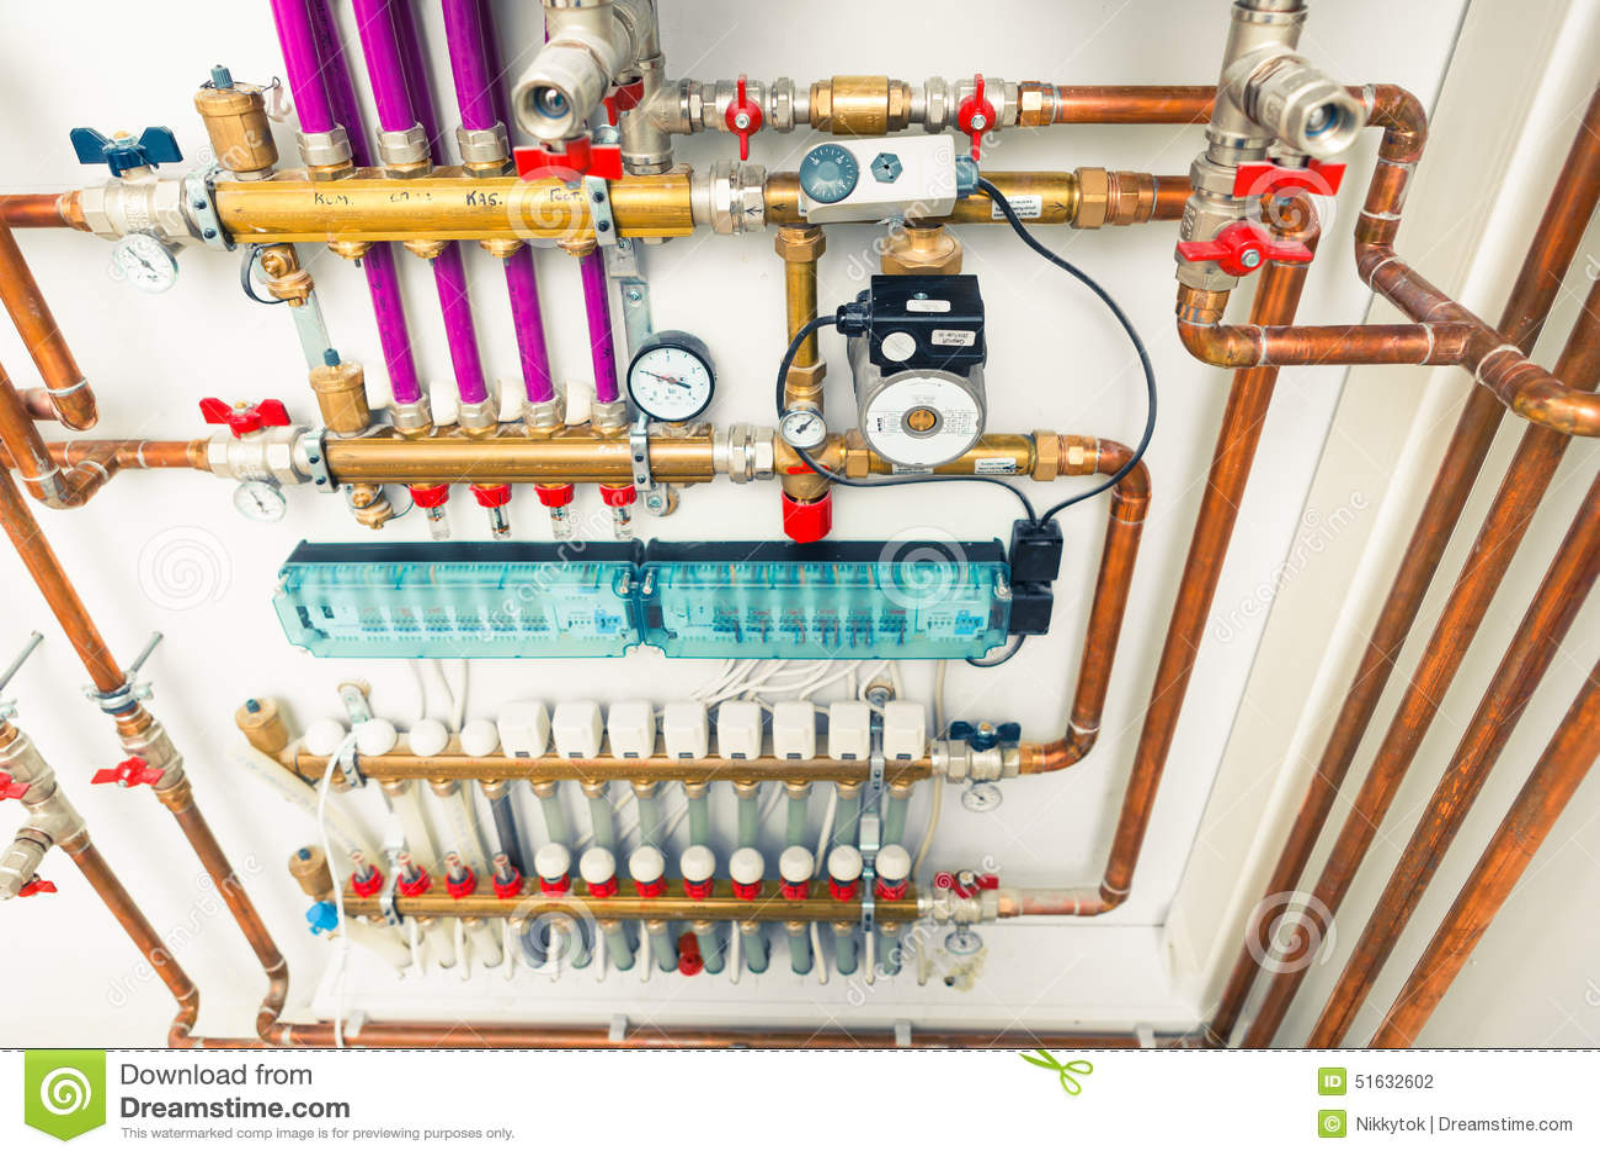 Underfloor Heating System Stock Photo Image 51632602